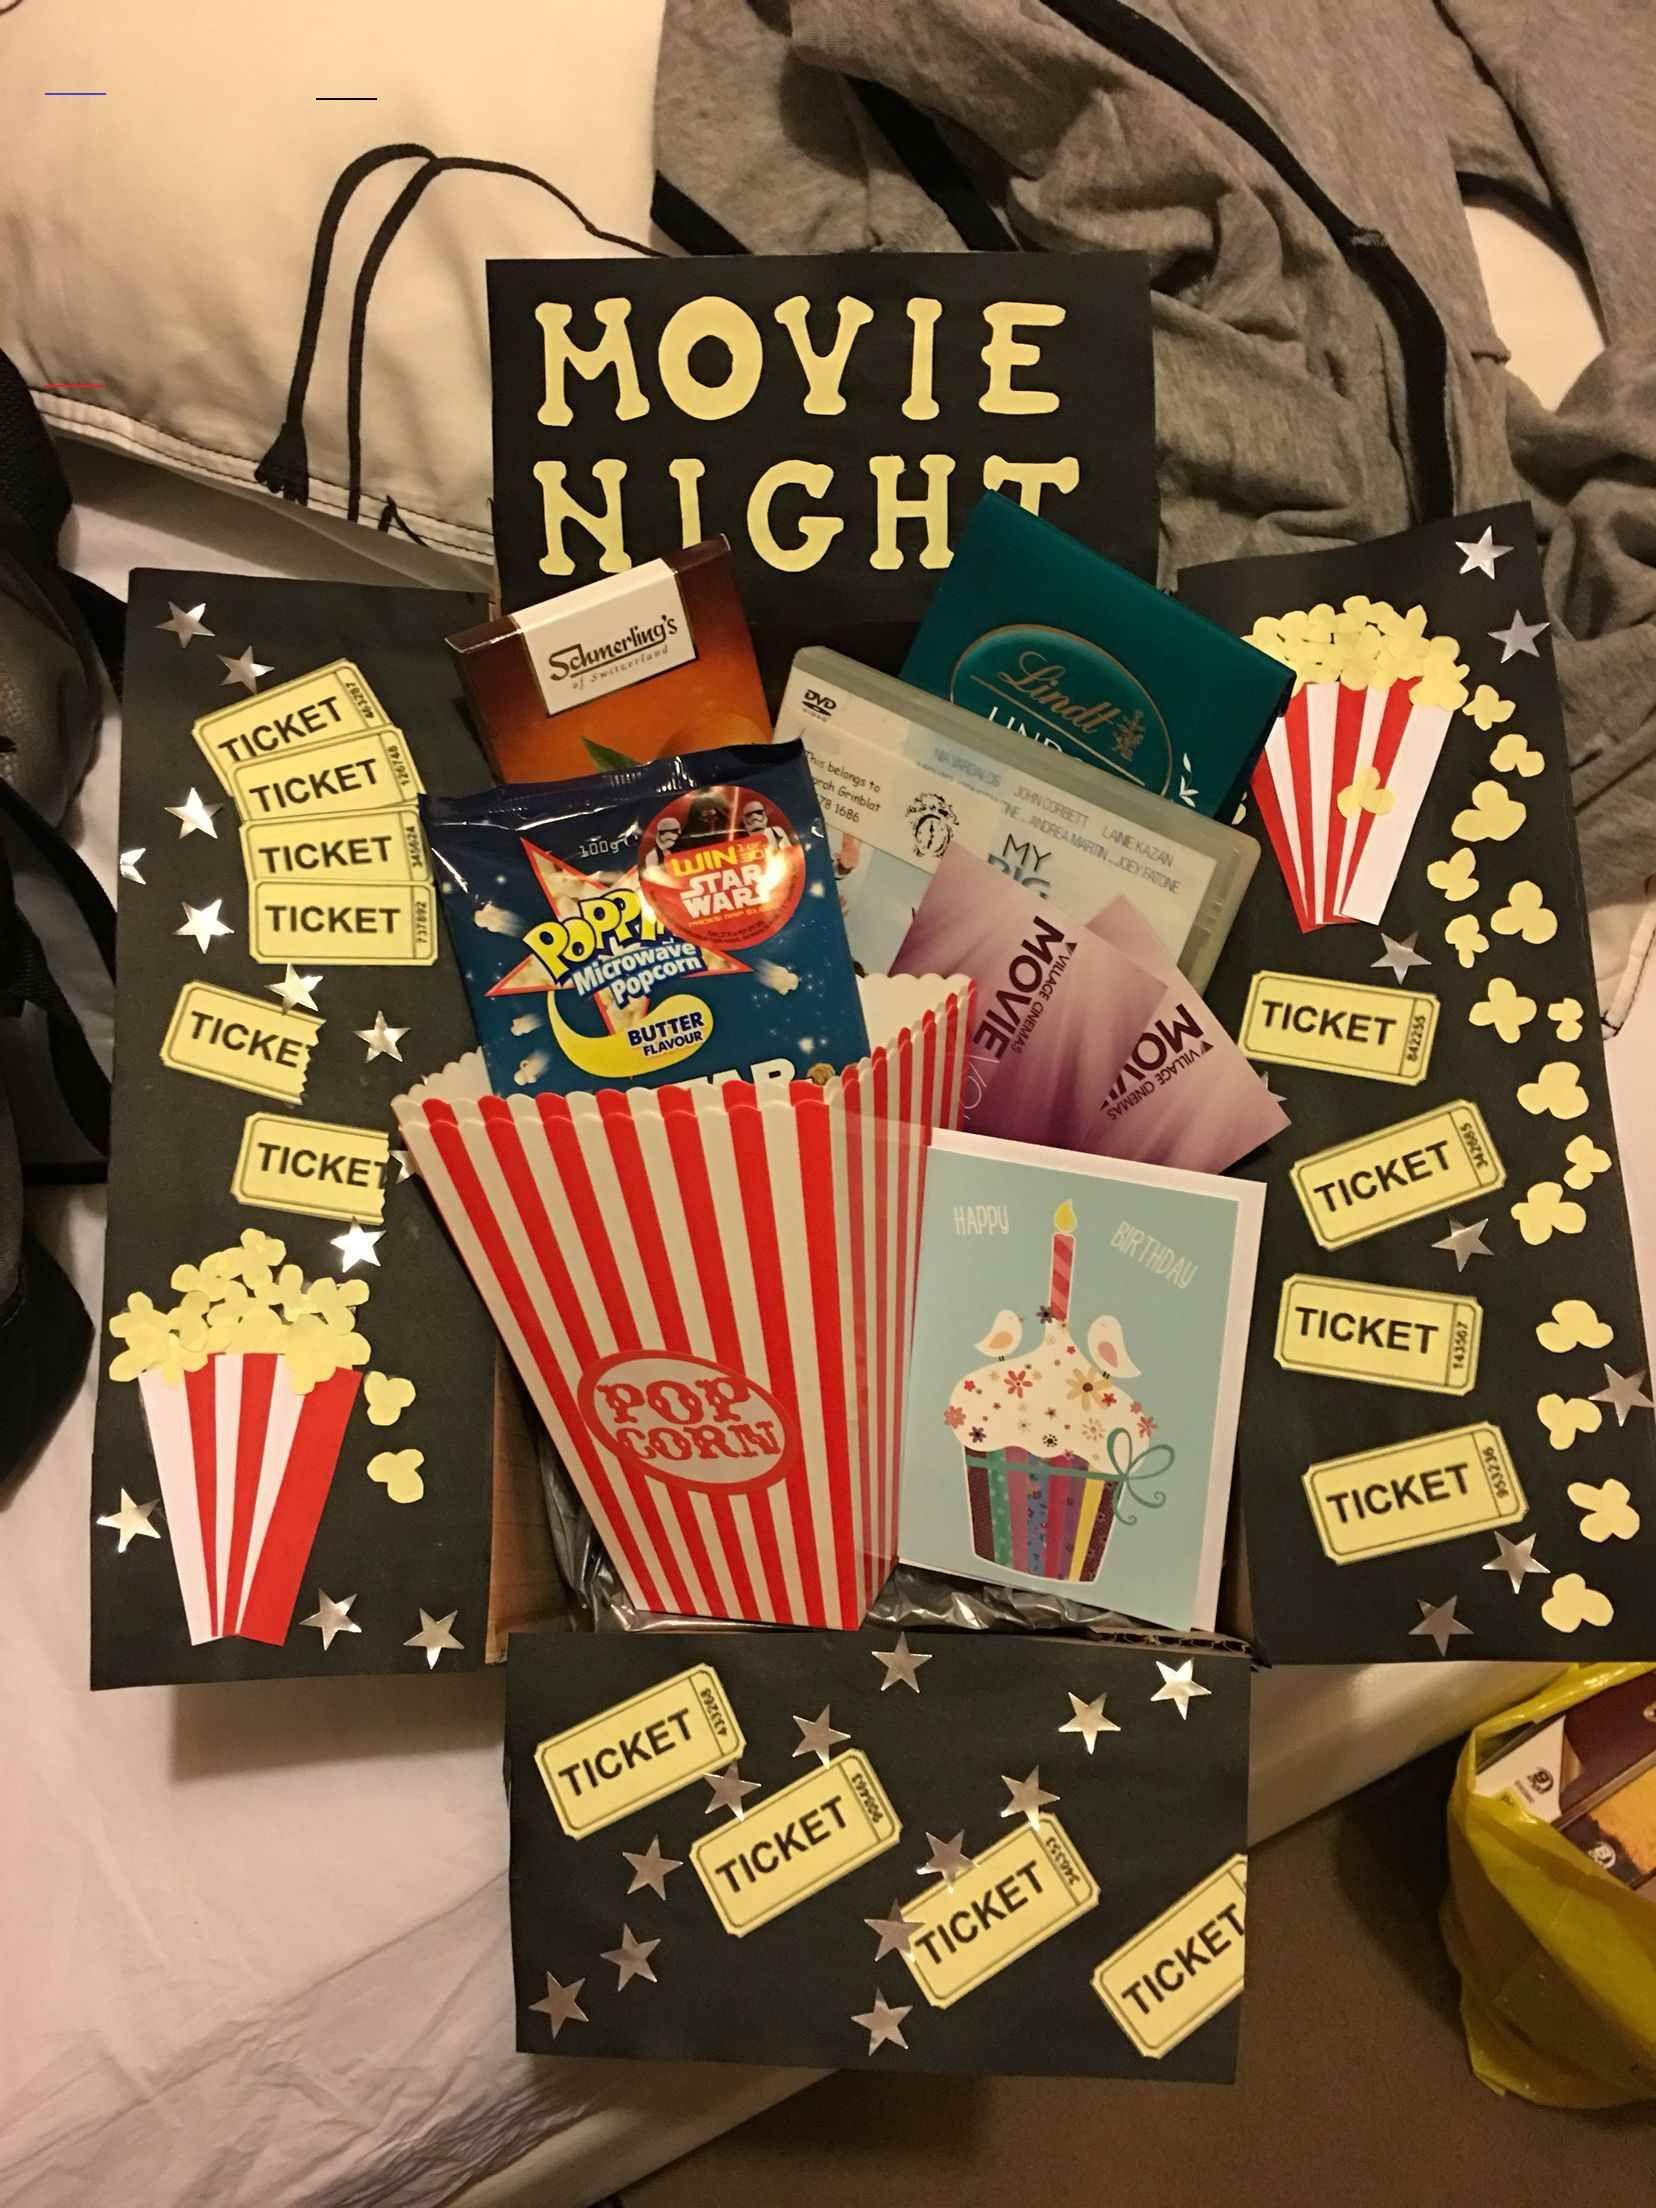 kinoboxgeschenk in 2020 Movie night gift, Sister